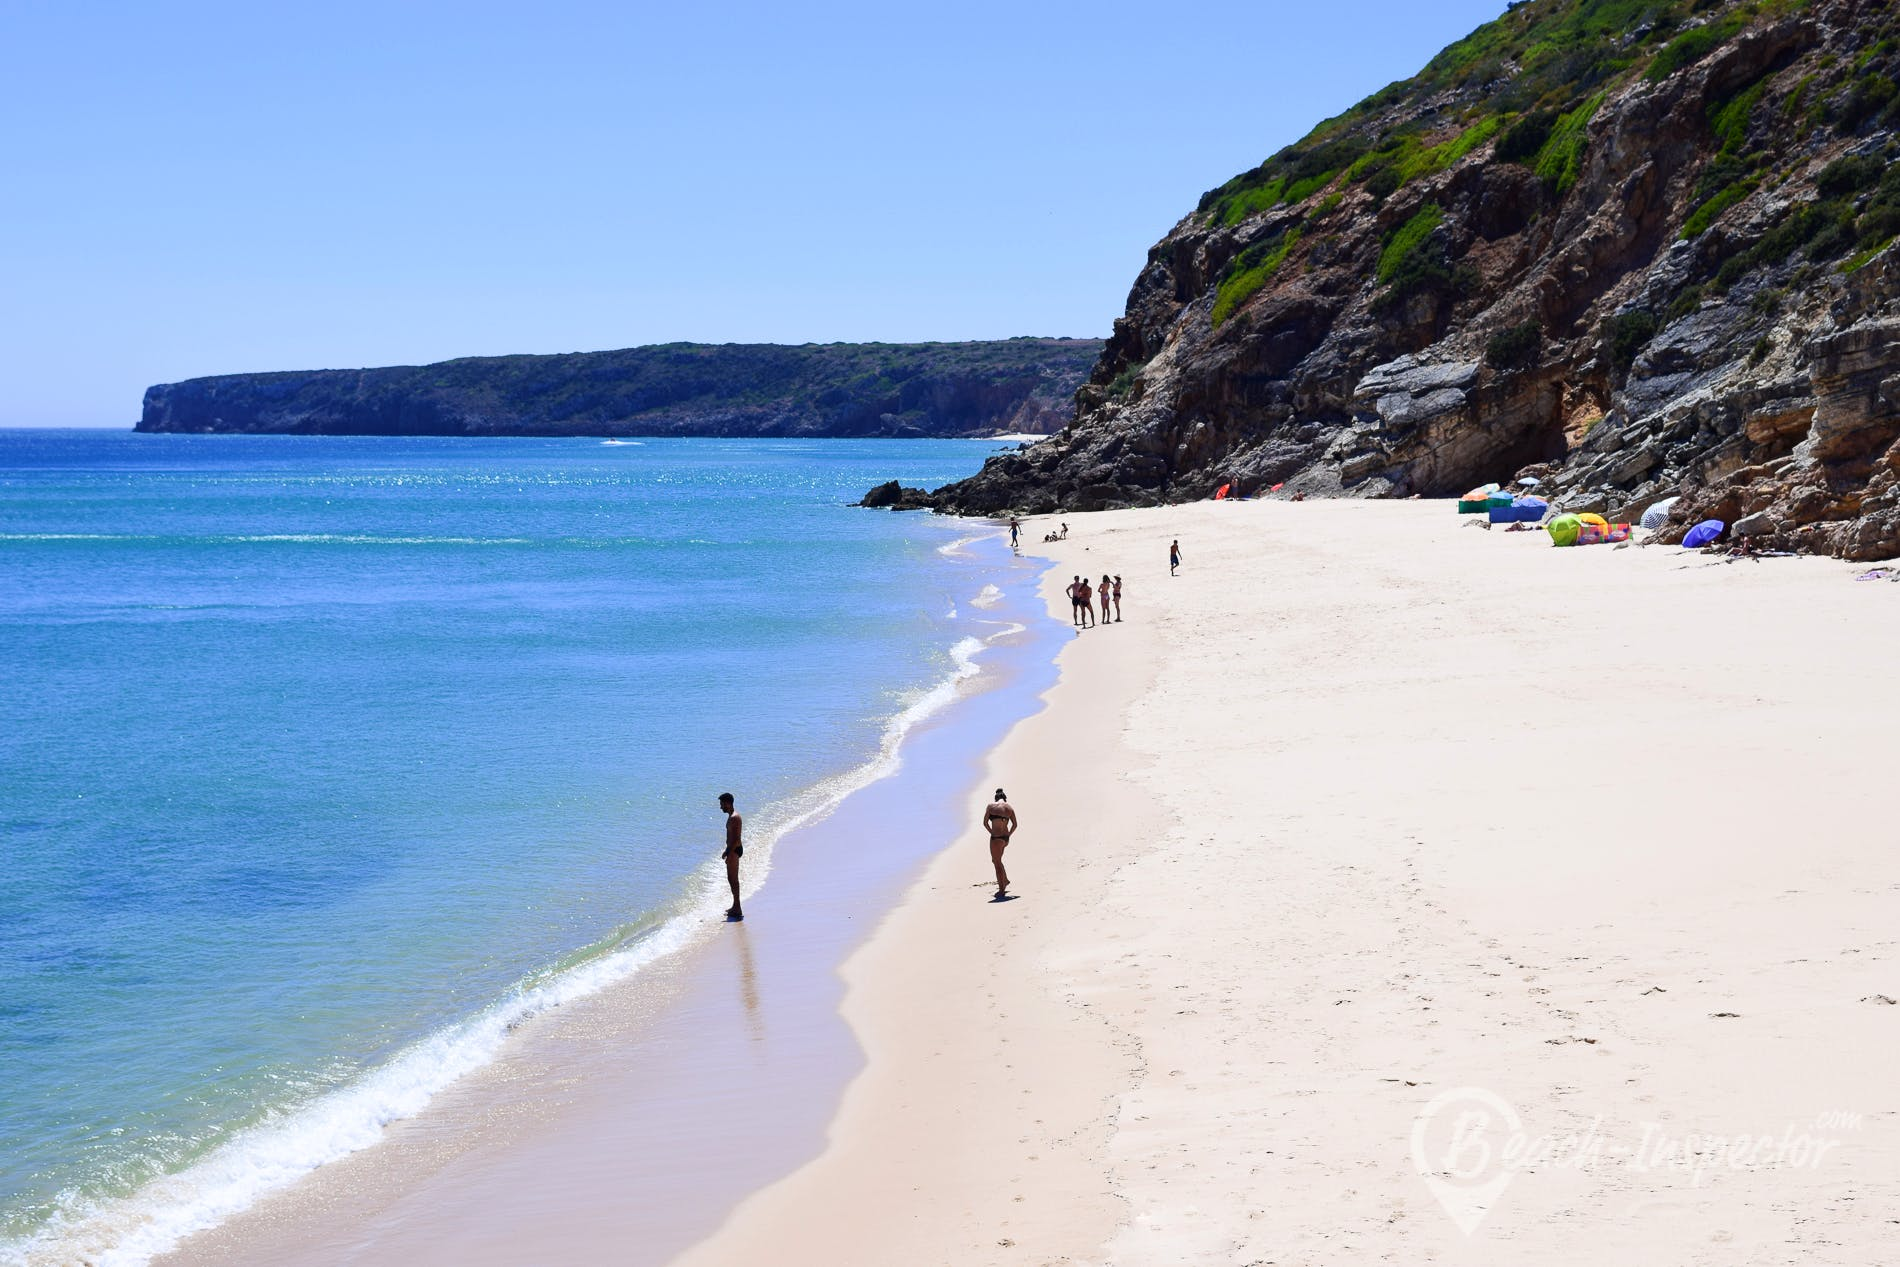 Playa Praia da Figueira, Algarve, Portugal